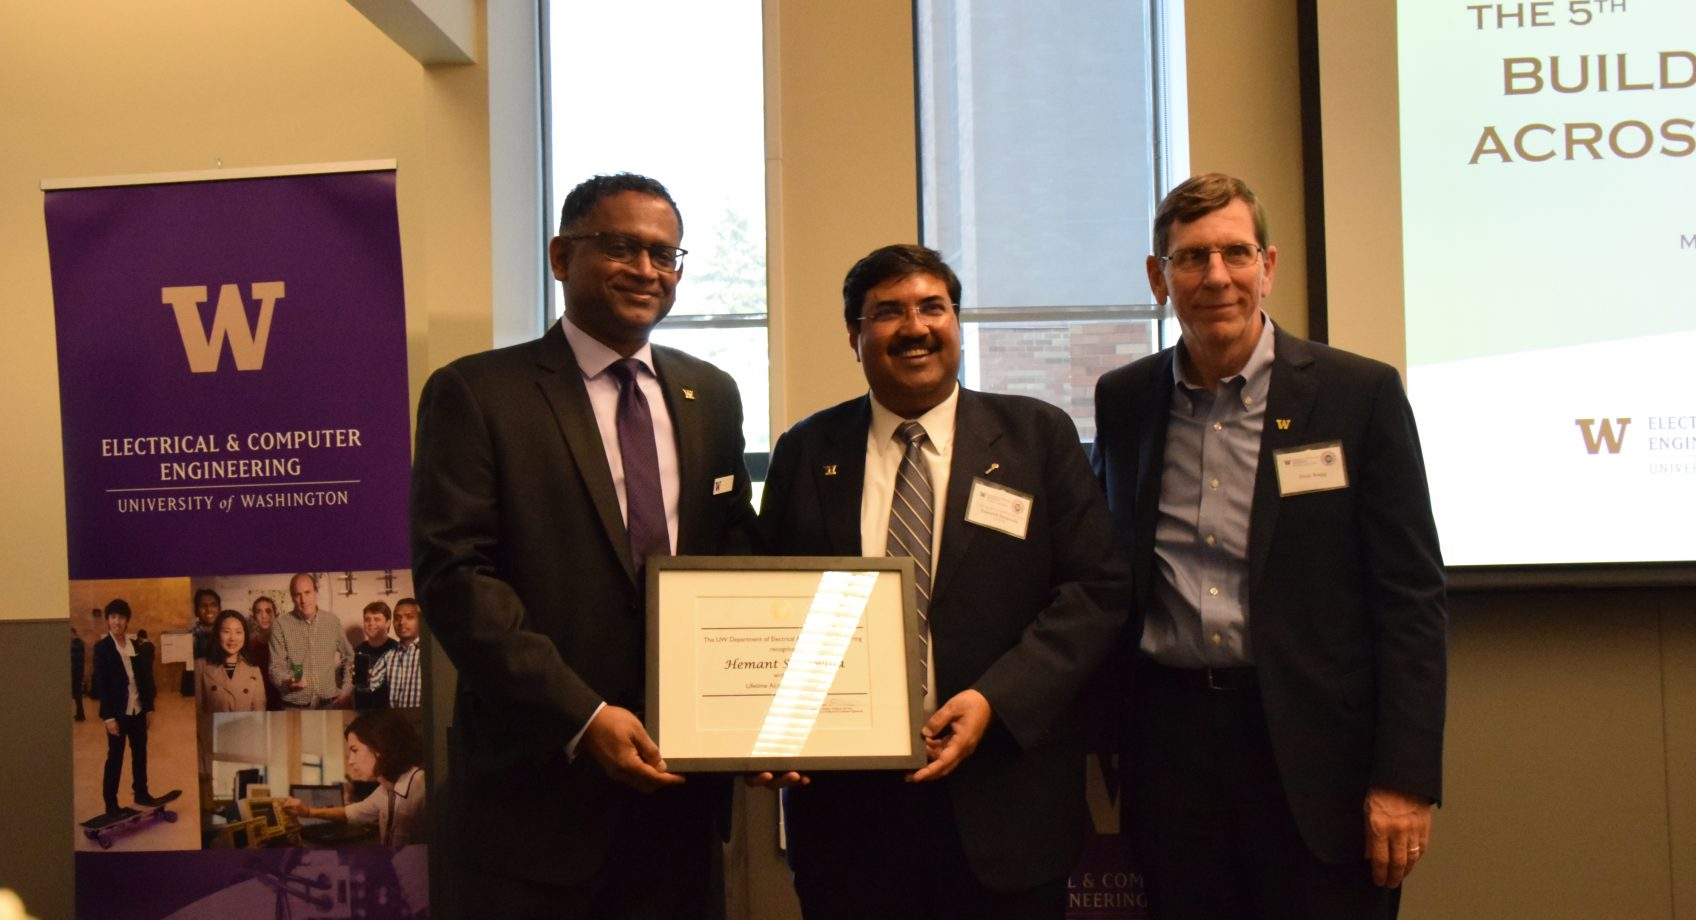 ECE alum Hemant Sonawala honored with lifetime achievement award Banner